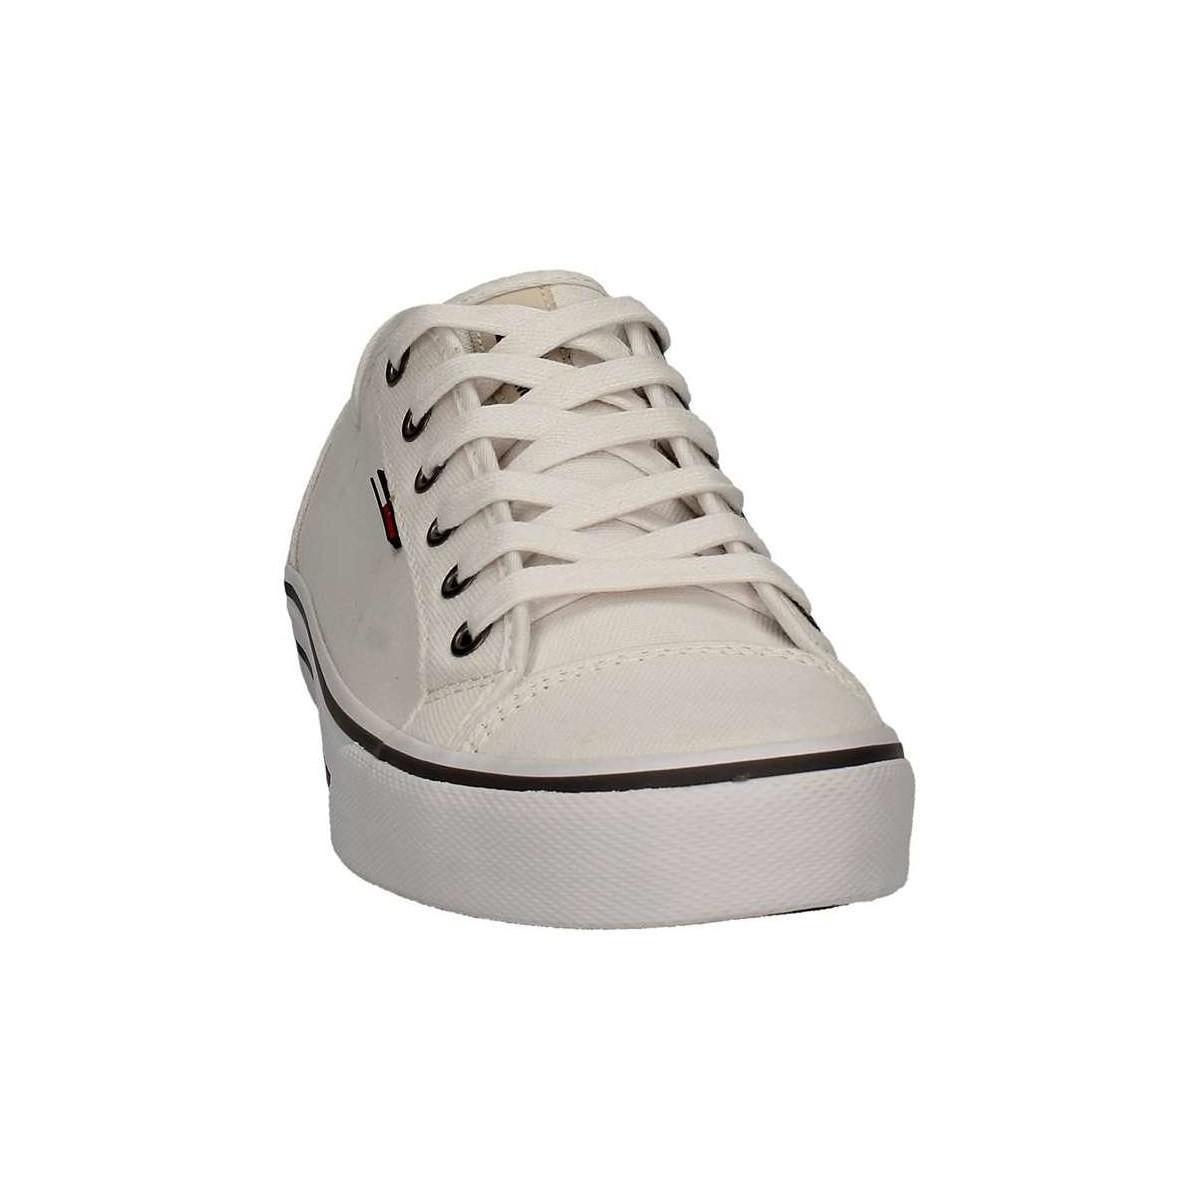 9ed3e175efd144 Tommy Hilfiger Fm0fm00324 Sneakers Man White Men s Walking Boots In ...